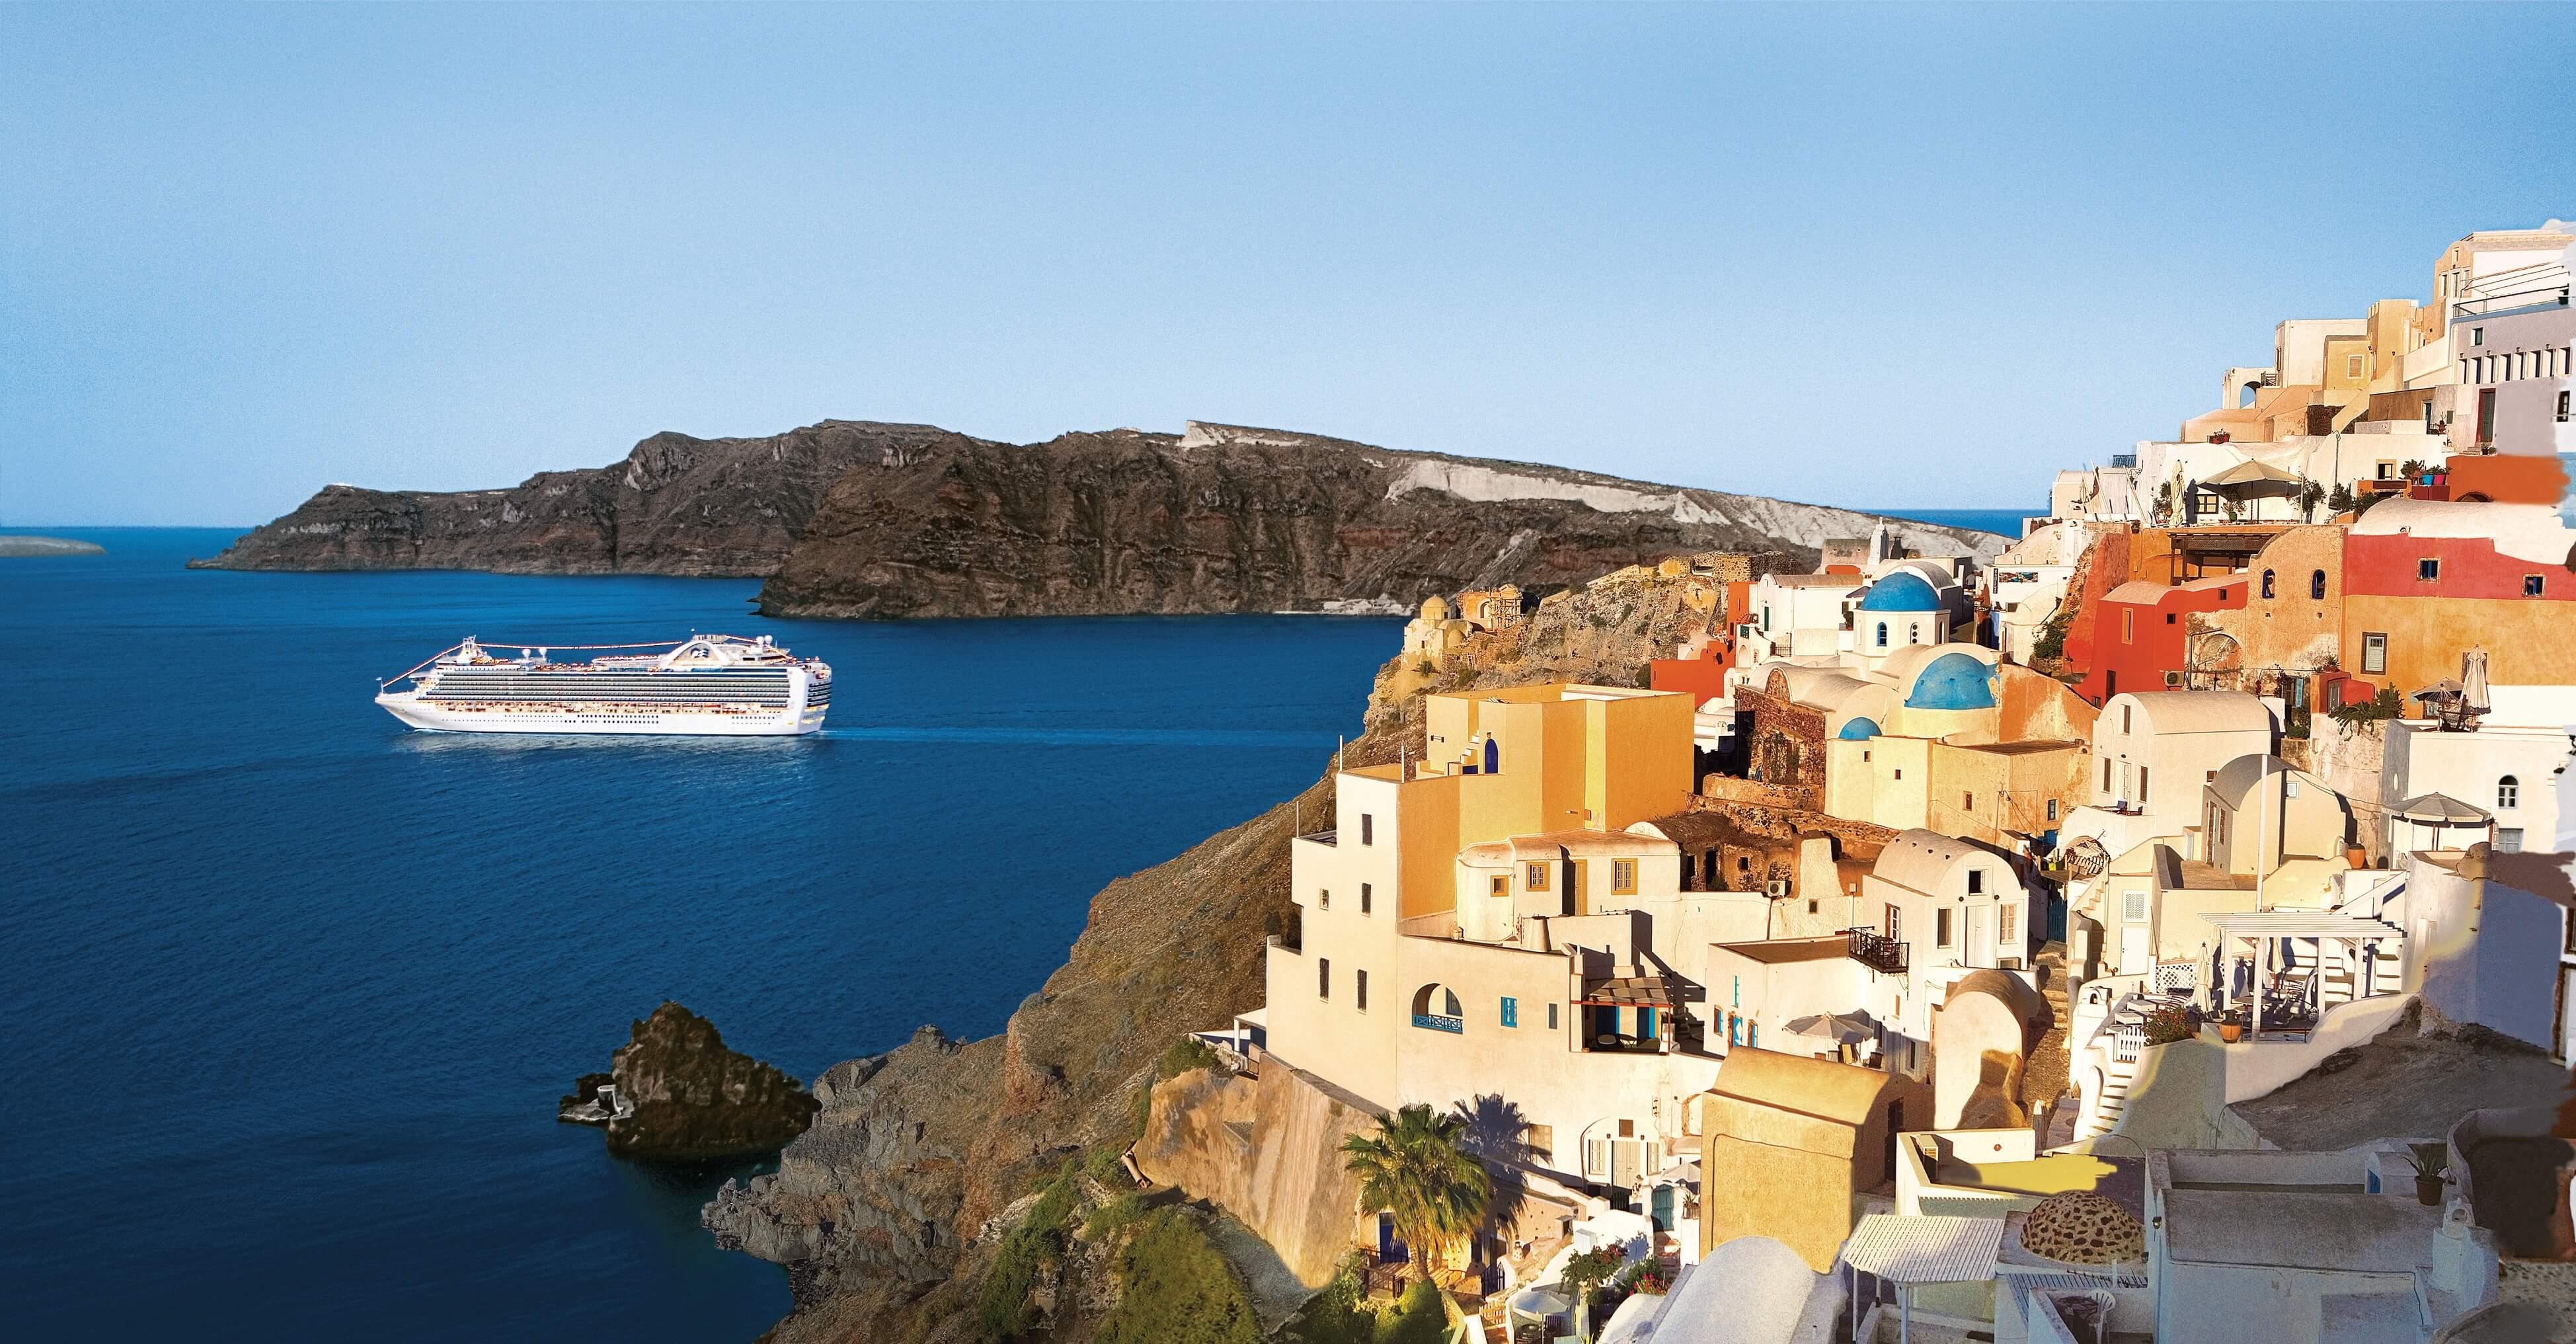 Princess Cruises launches 2021 Europe Season